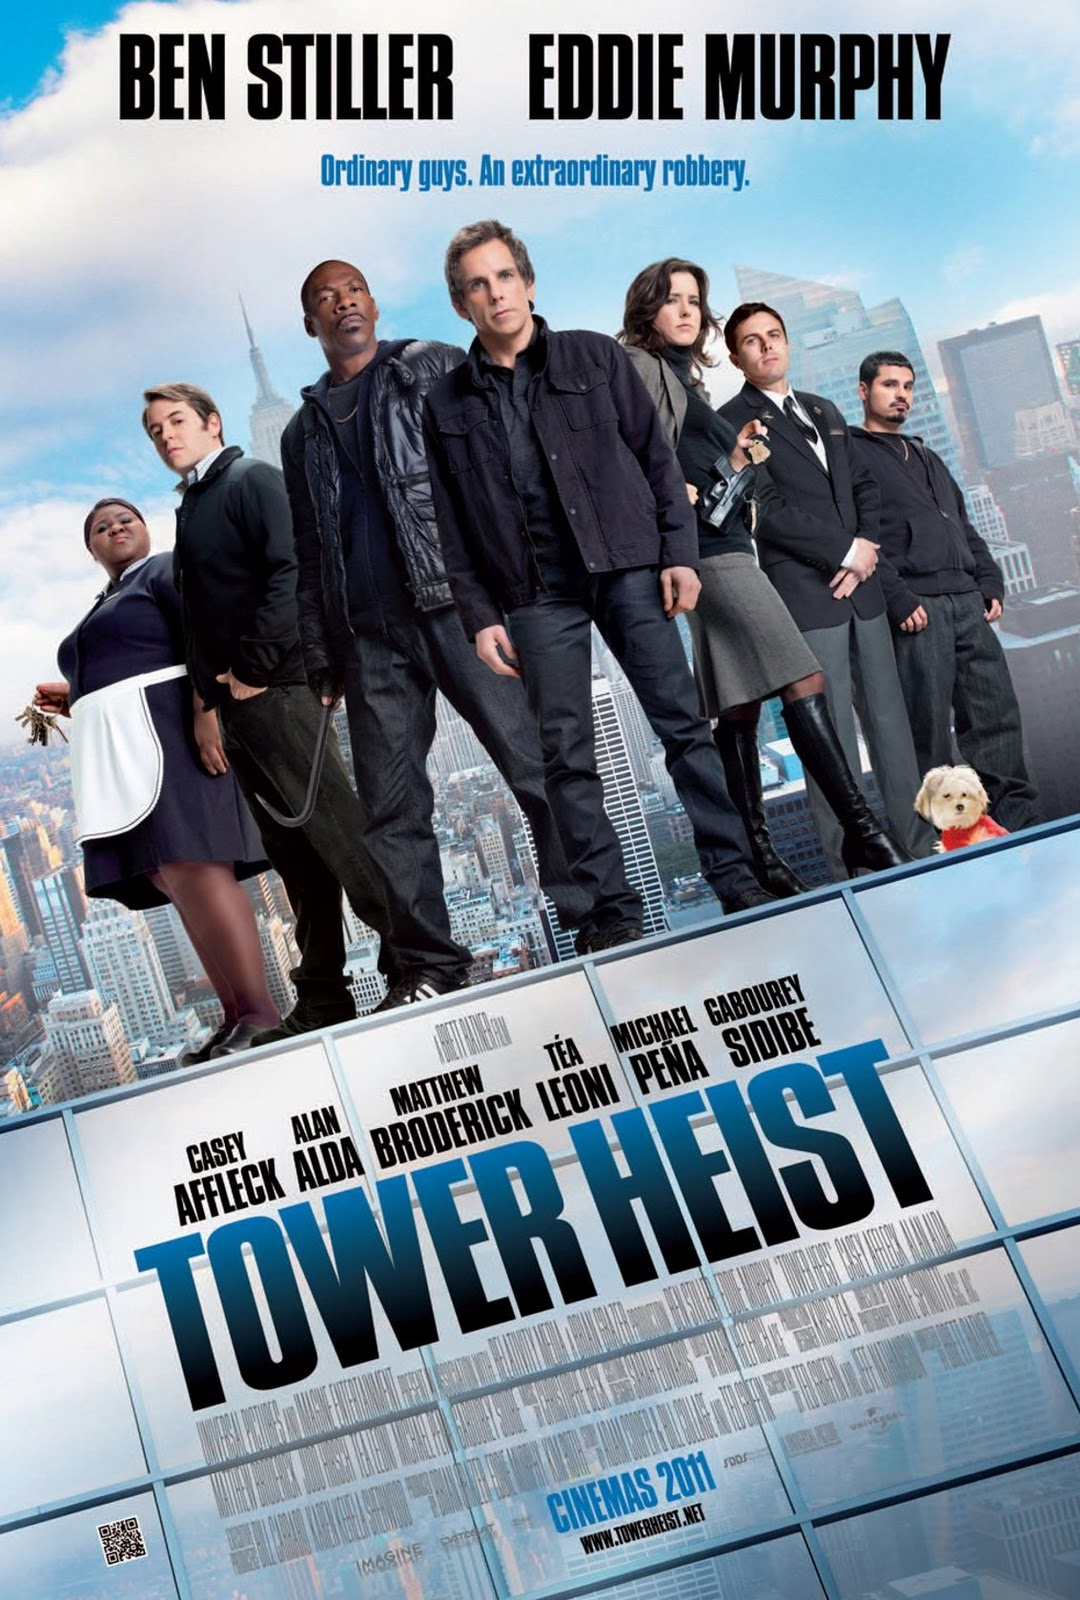 http://2.bp.blogspot.com/-BLELARZvZv0/TpmoBHD_QII/AAAAAAAAAG4/wMMdnRhbaEI/s1600/tower+heist.jpg